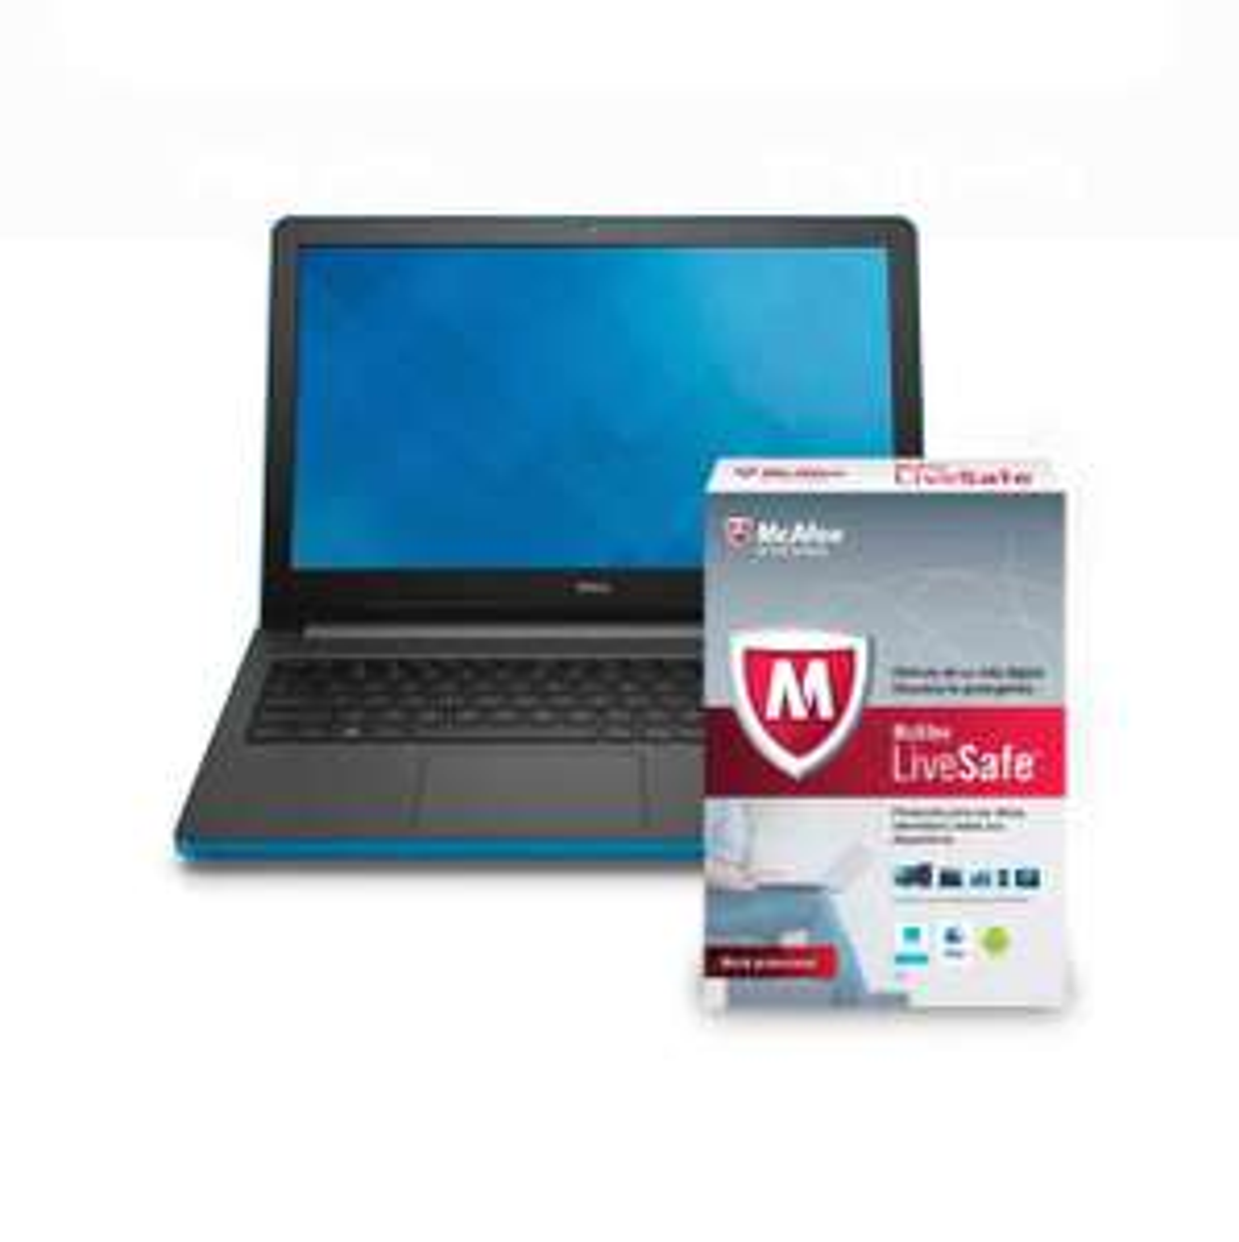 Walmart en línea: Laptop Dell Inspiron 15-5558 Core i7 6 GB RAM 1TB mas Mcafee